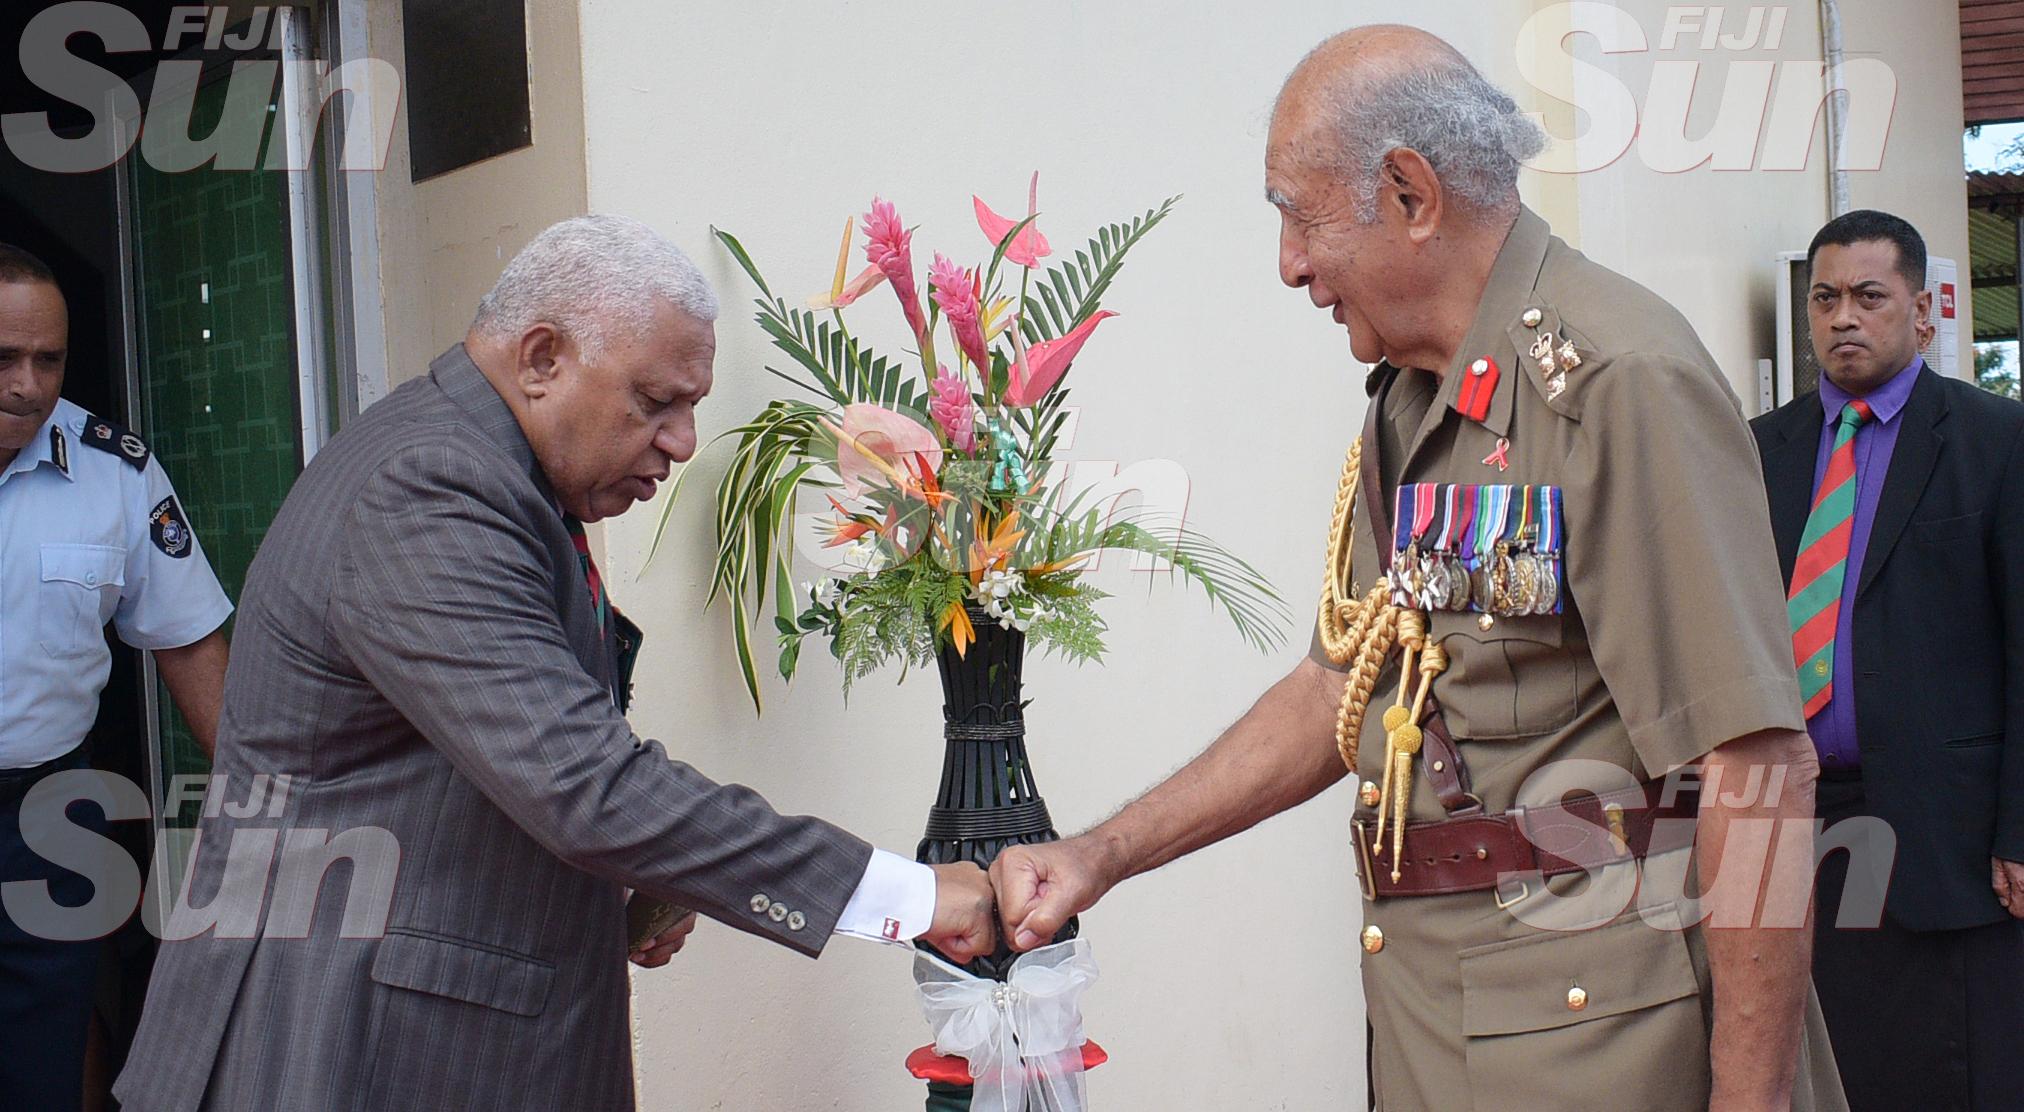 Prime Minister Voreqe Bainimarama congratulates Brigadier General (Retired) Ratu Epeli Nailatikau on his appointment Colonel of the Regiment at QEB Church on July 21, 2020. Photo: Ronald Kumar.